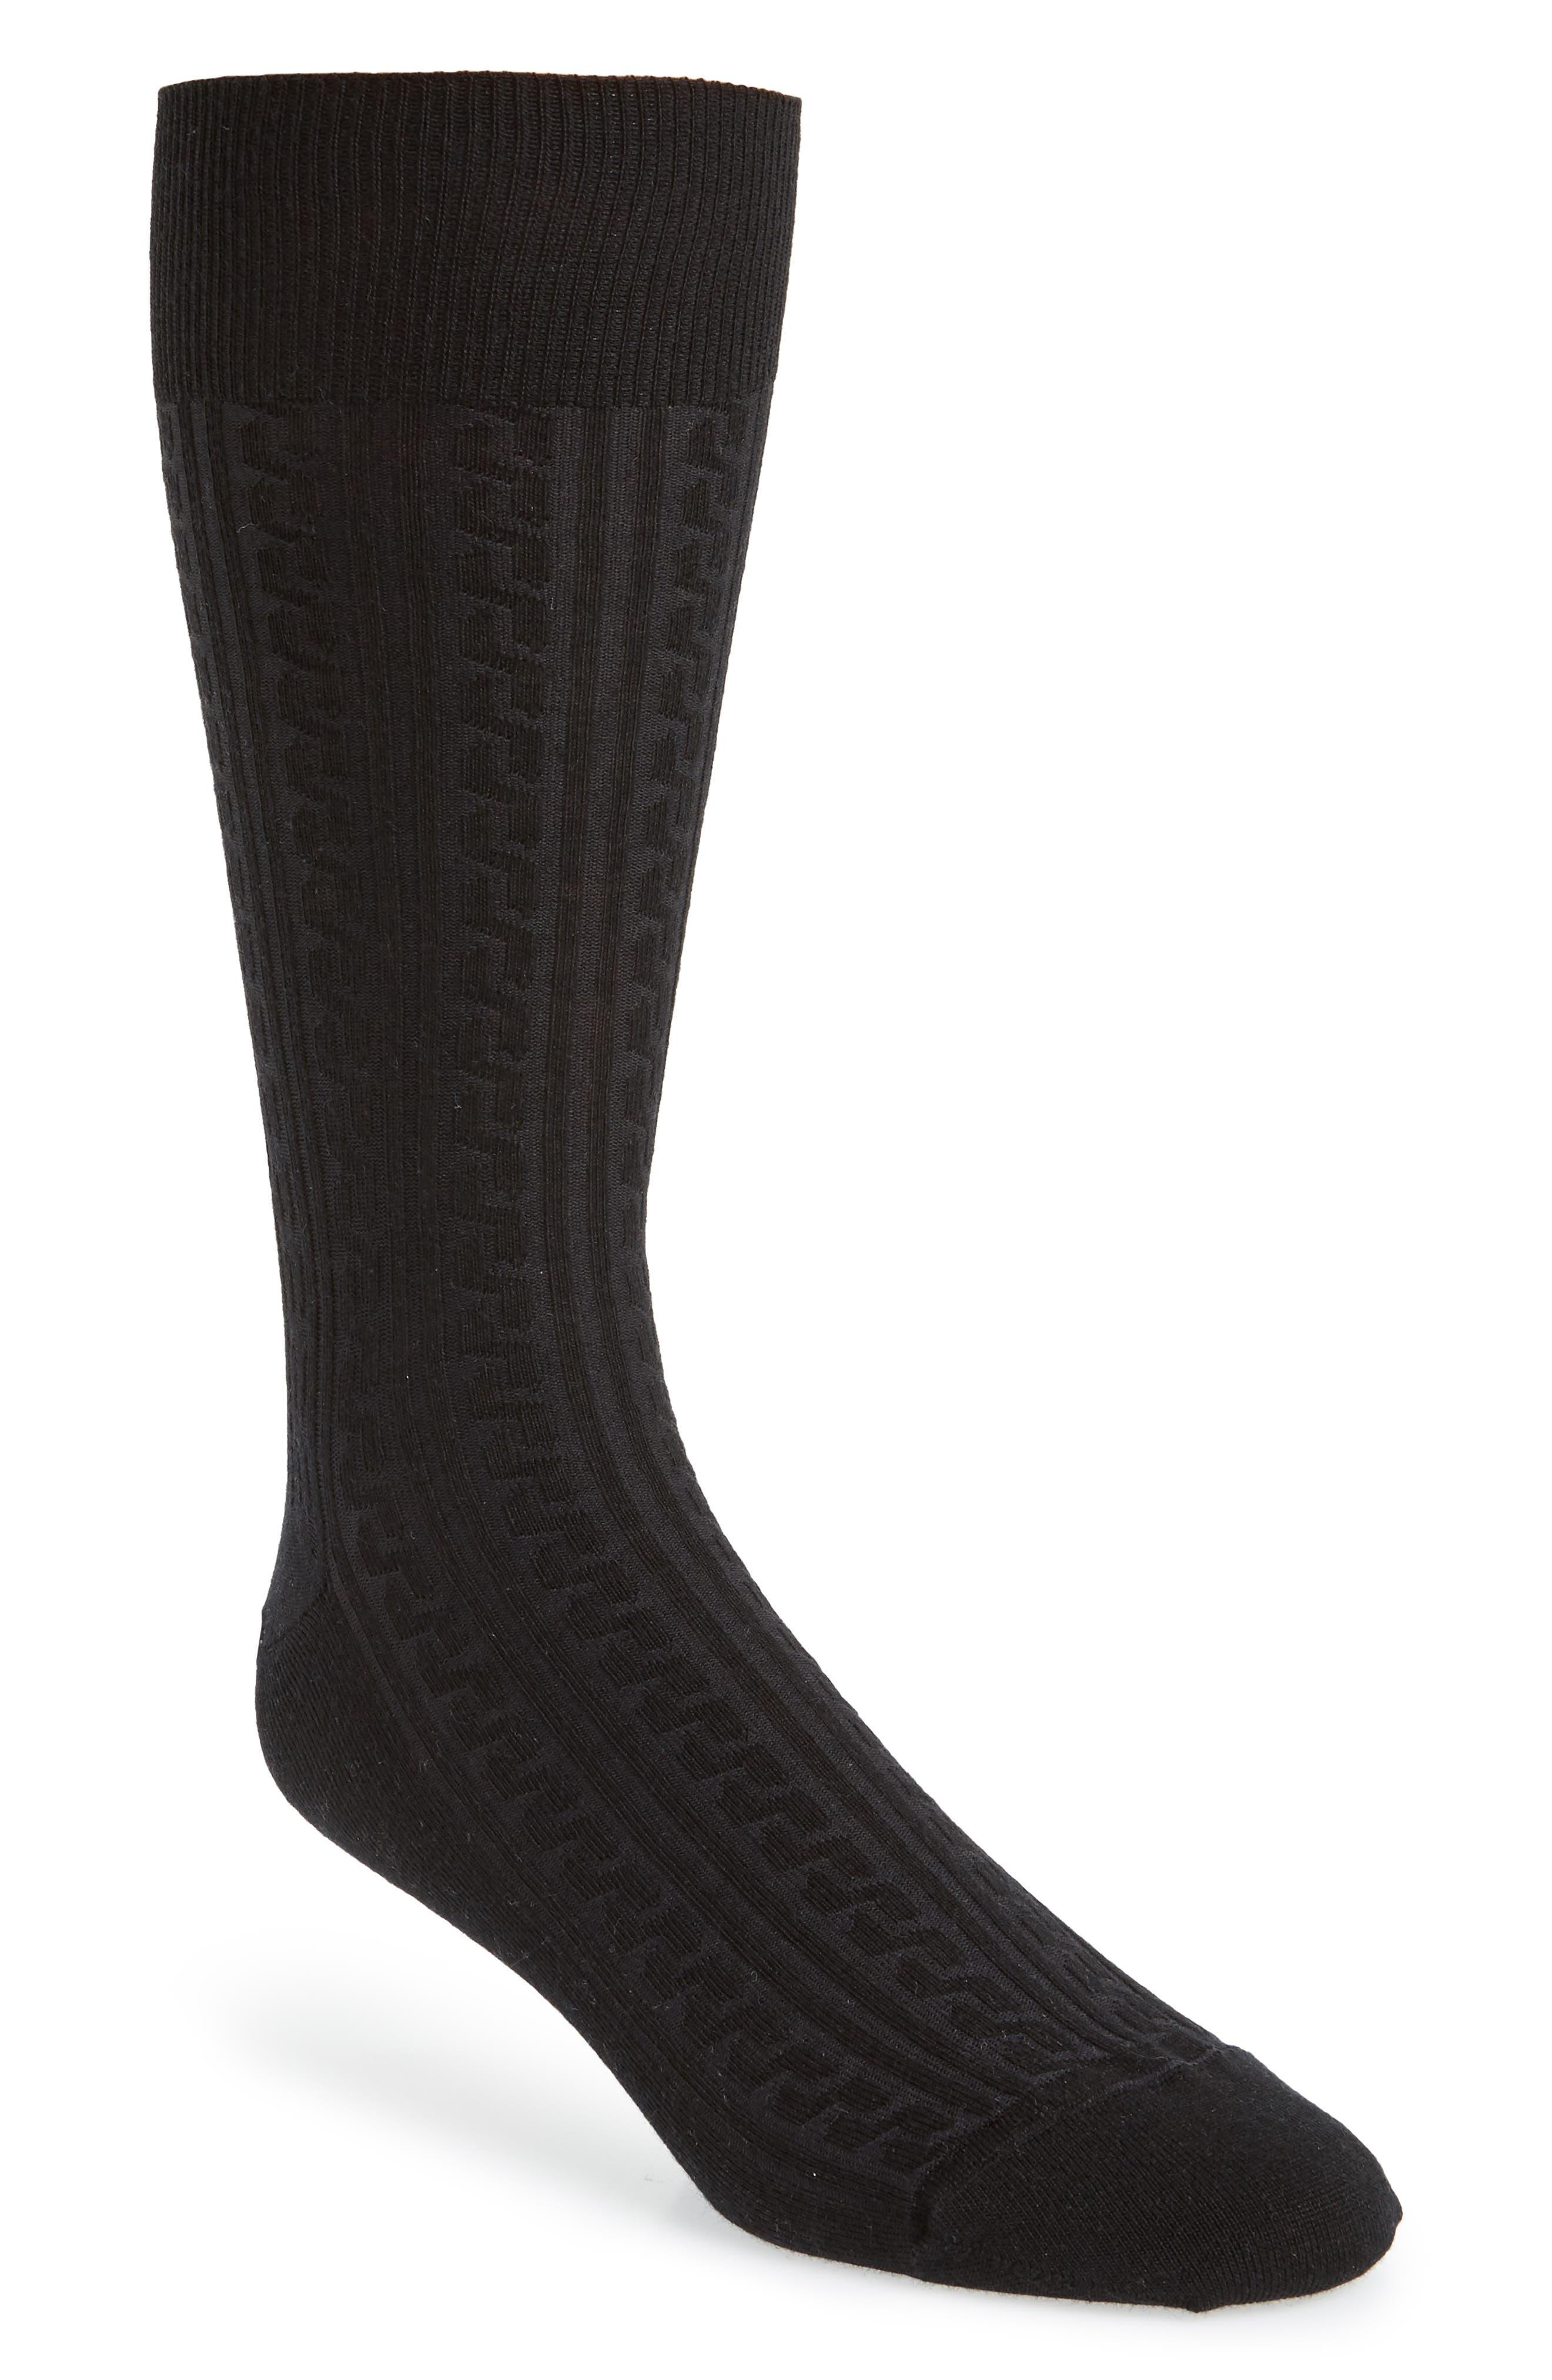 Cable Knit Merino Blend Socks,                         Main,                         color, 001